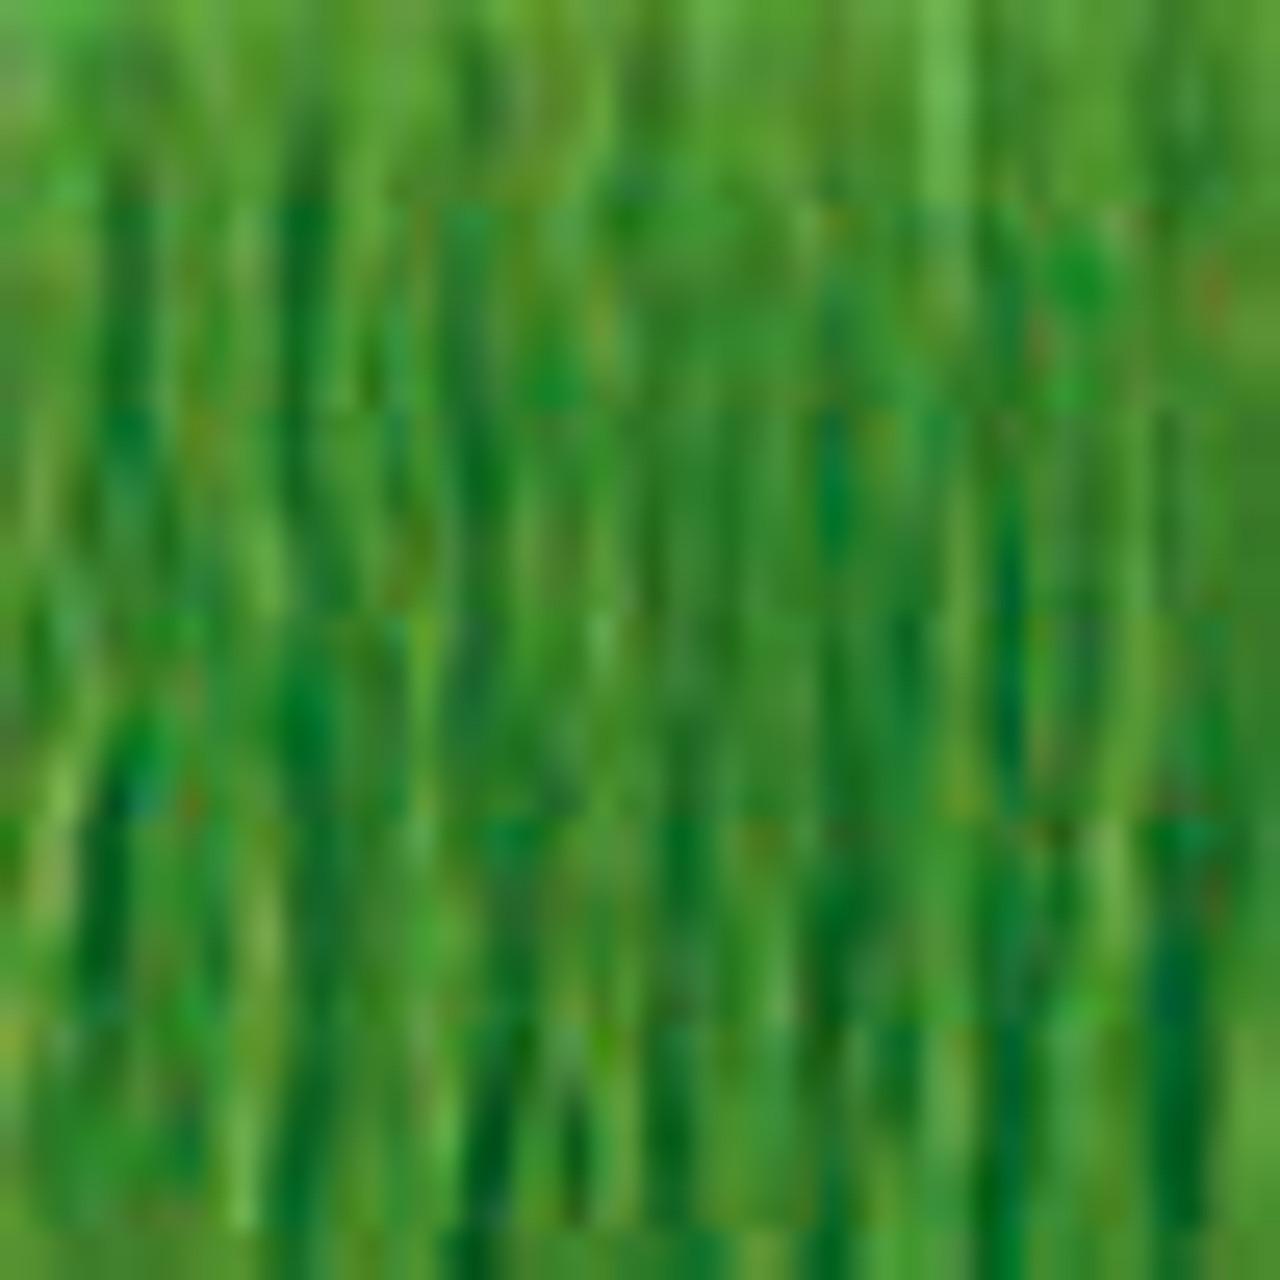 DMC # 905 Dark Parrot Green Floss / Thread